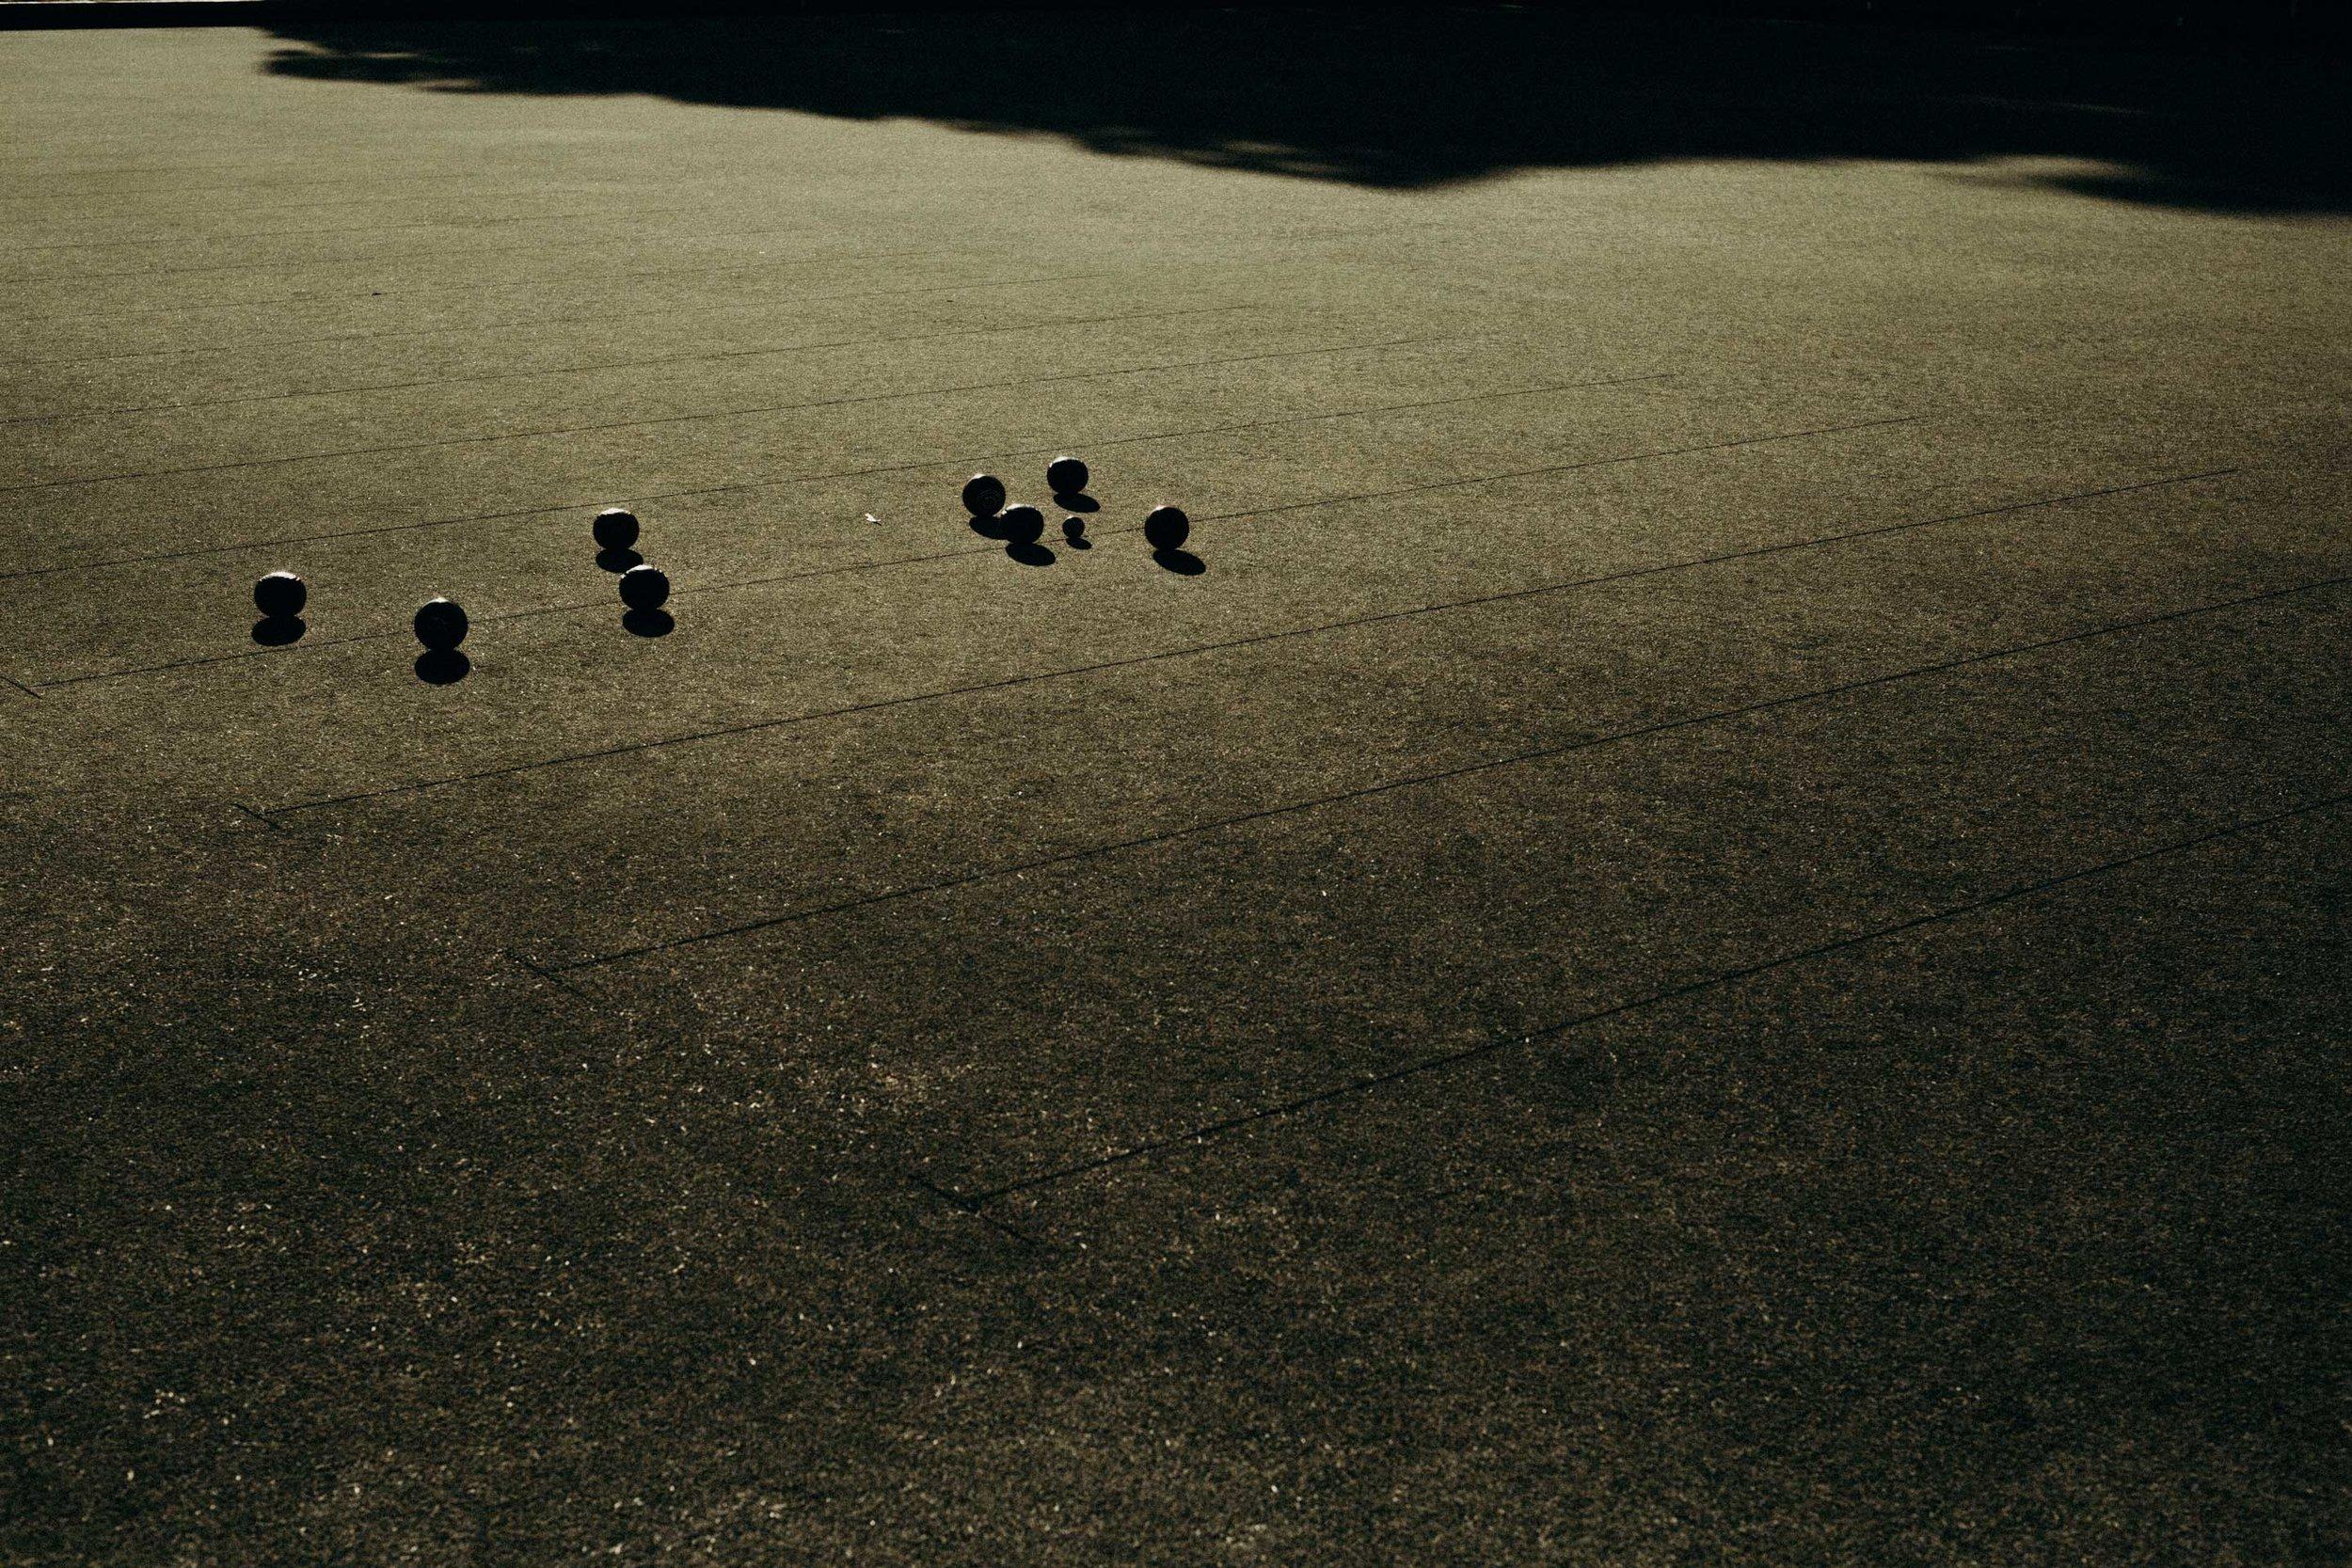 Play with Mosman's best – Mosman Park Bowls Club